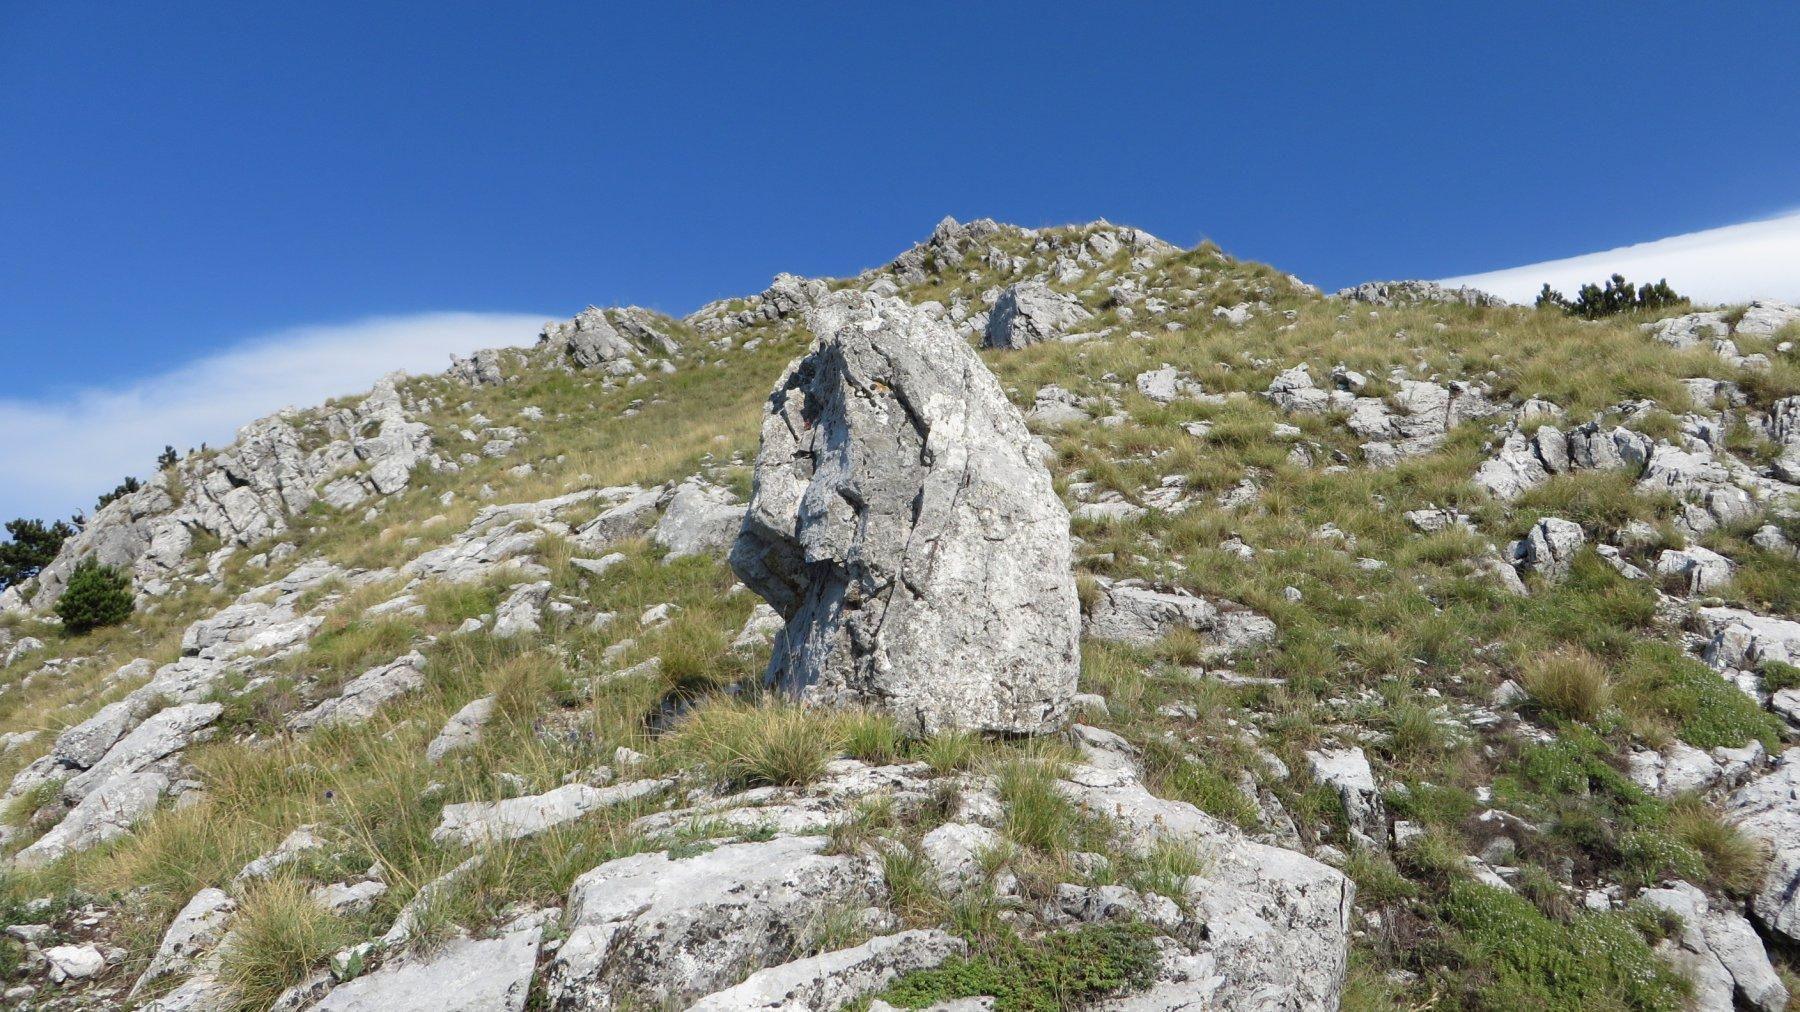 Monteada Sant'Agata Esero 2018-08-21